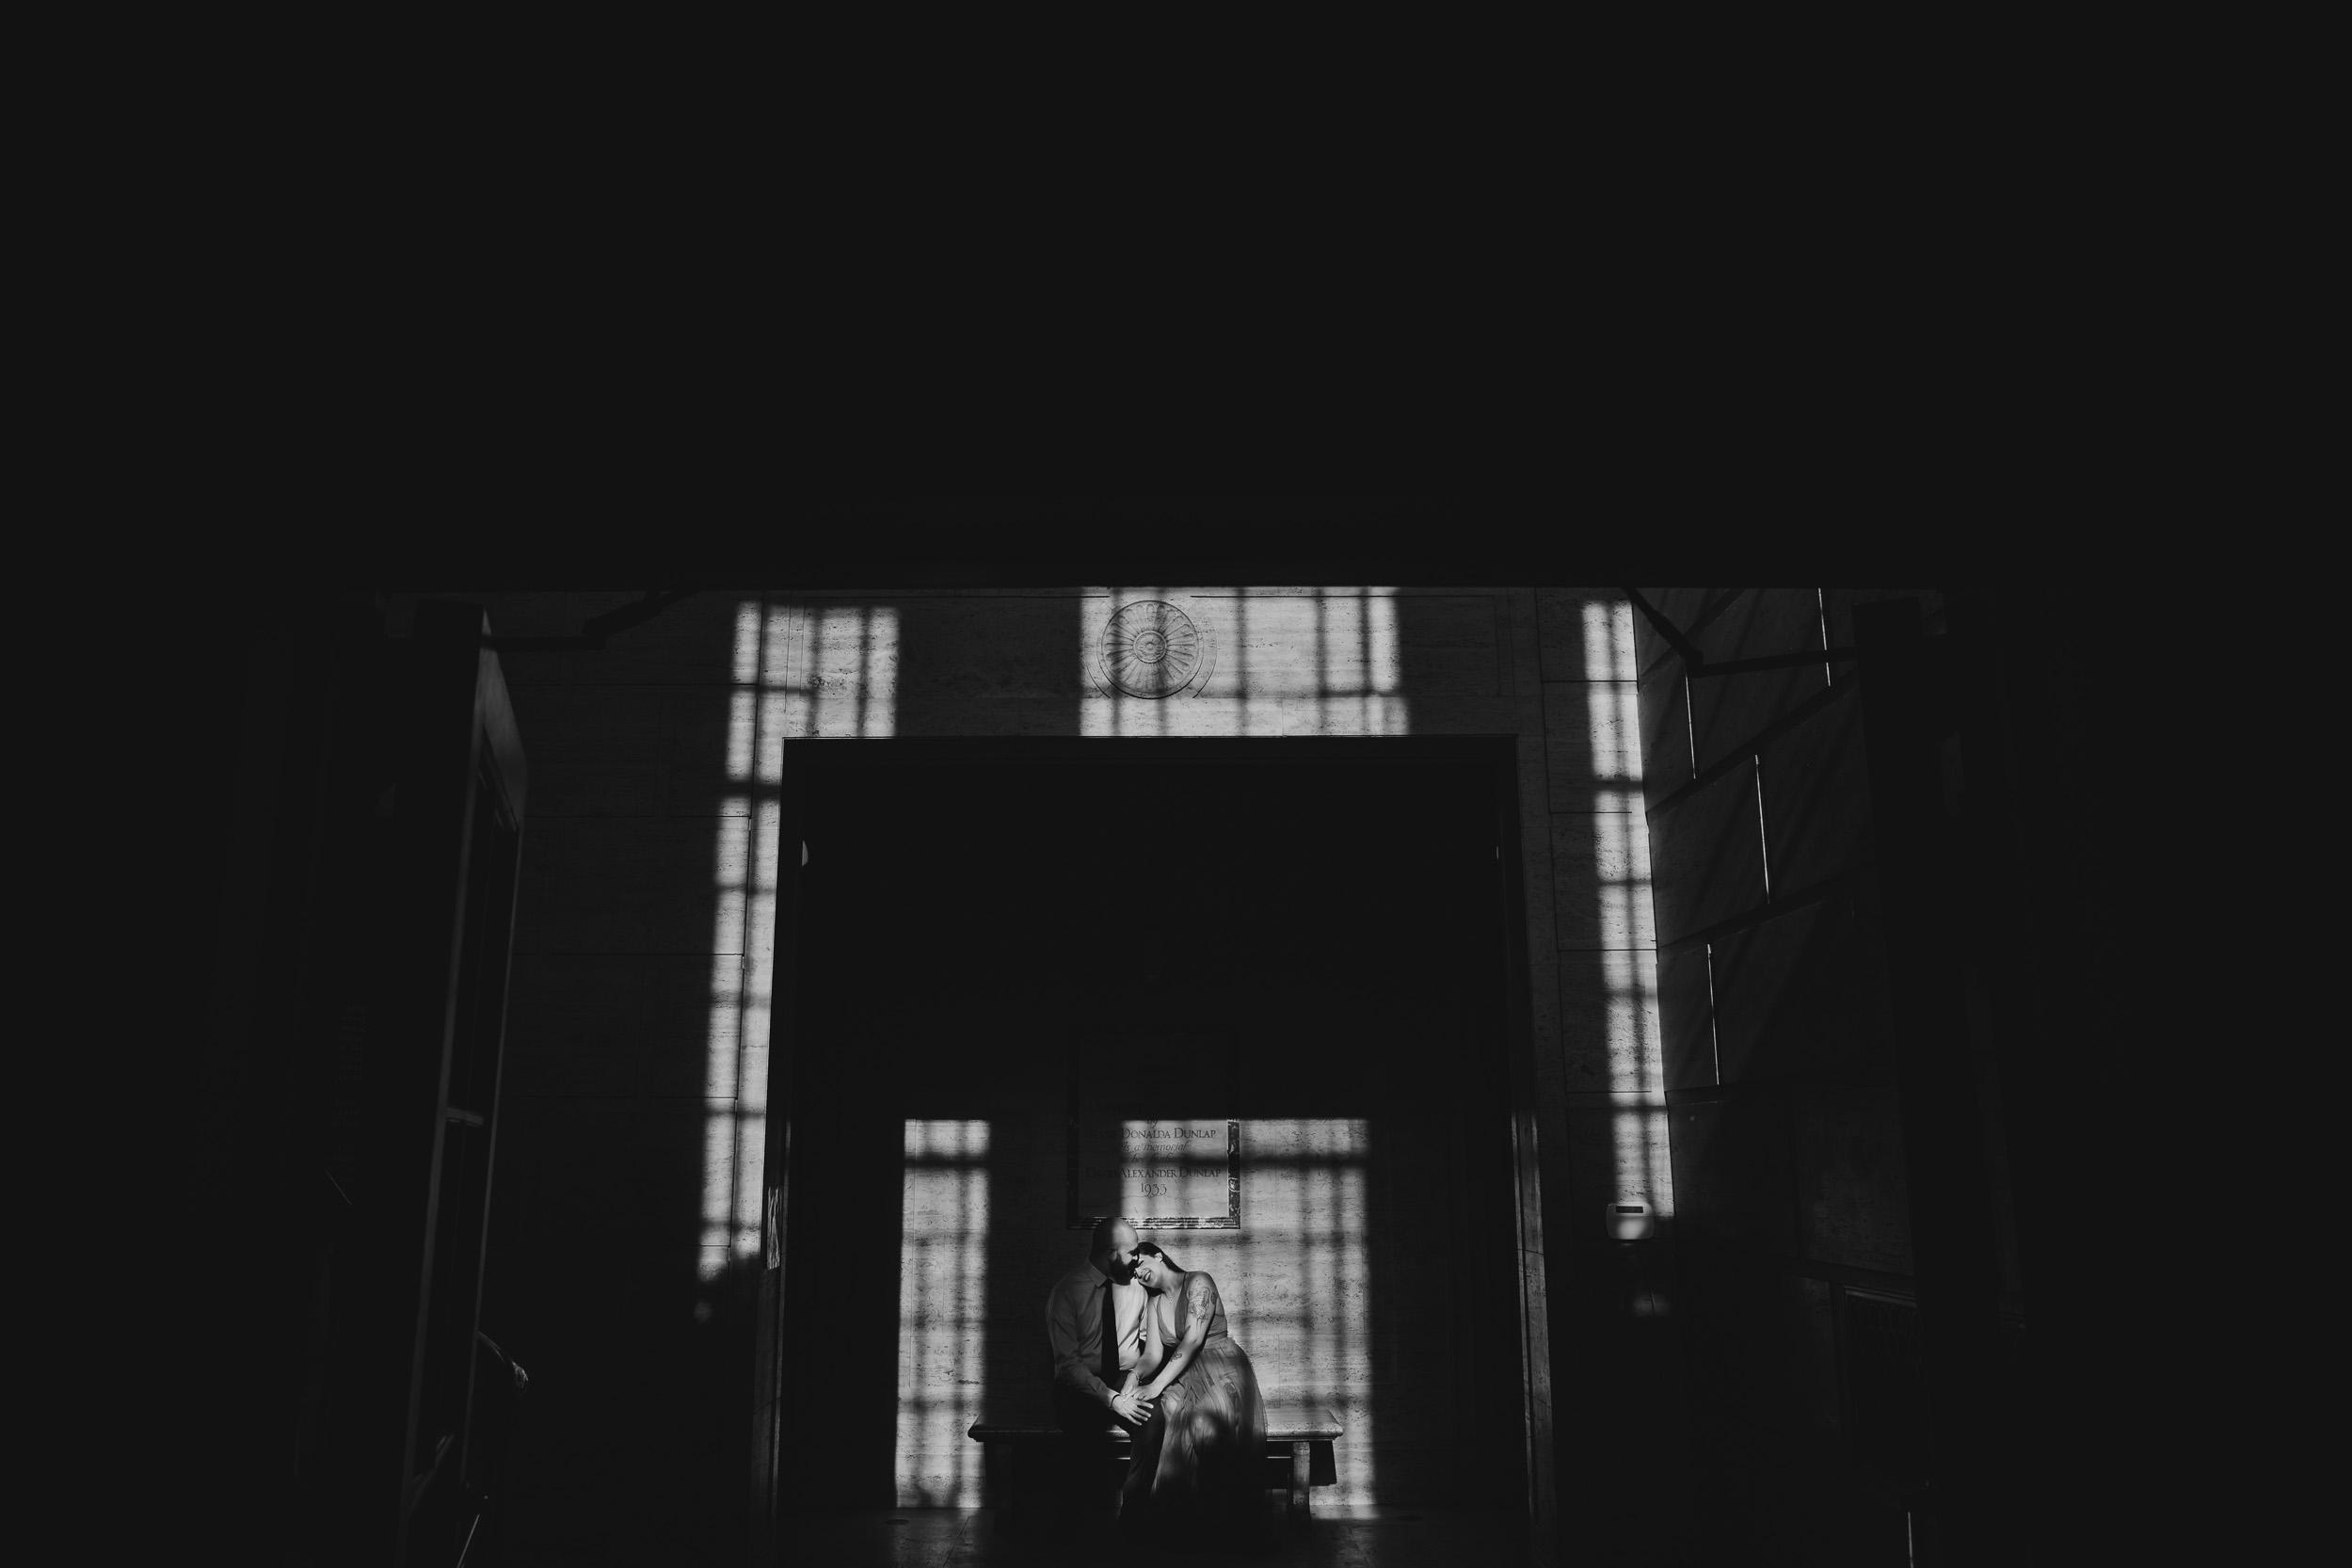 20190526_Kyleigh_&_Daniel_by_Ian_Xu_Studio-079.jpg